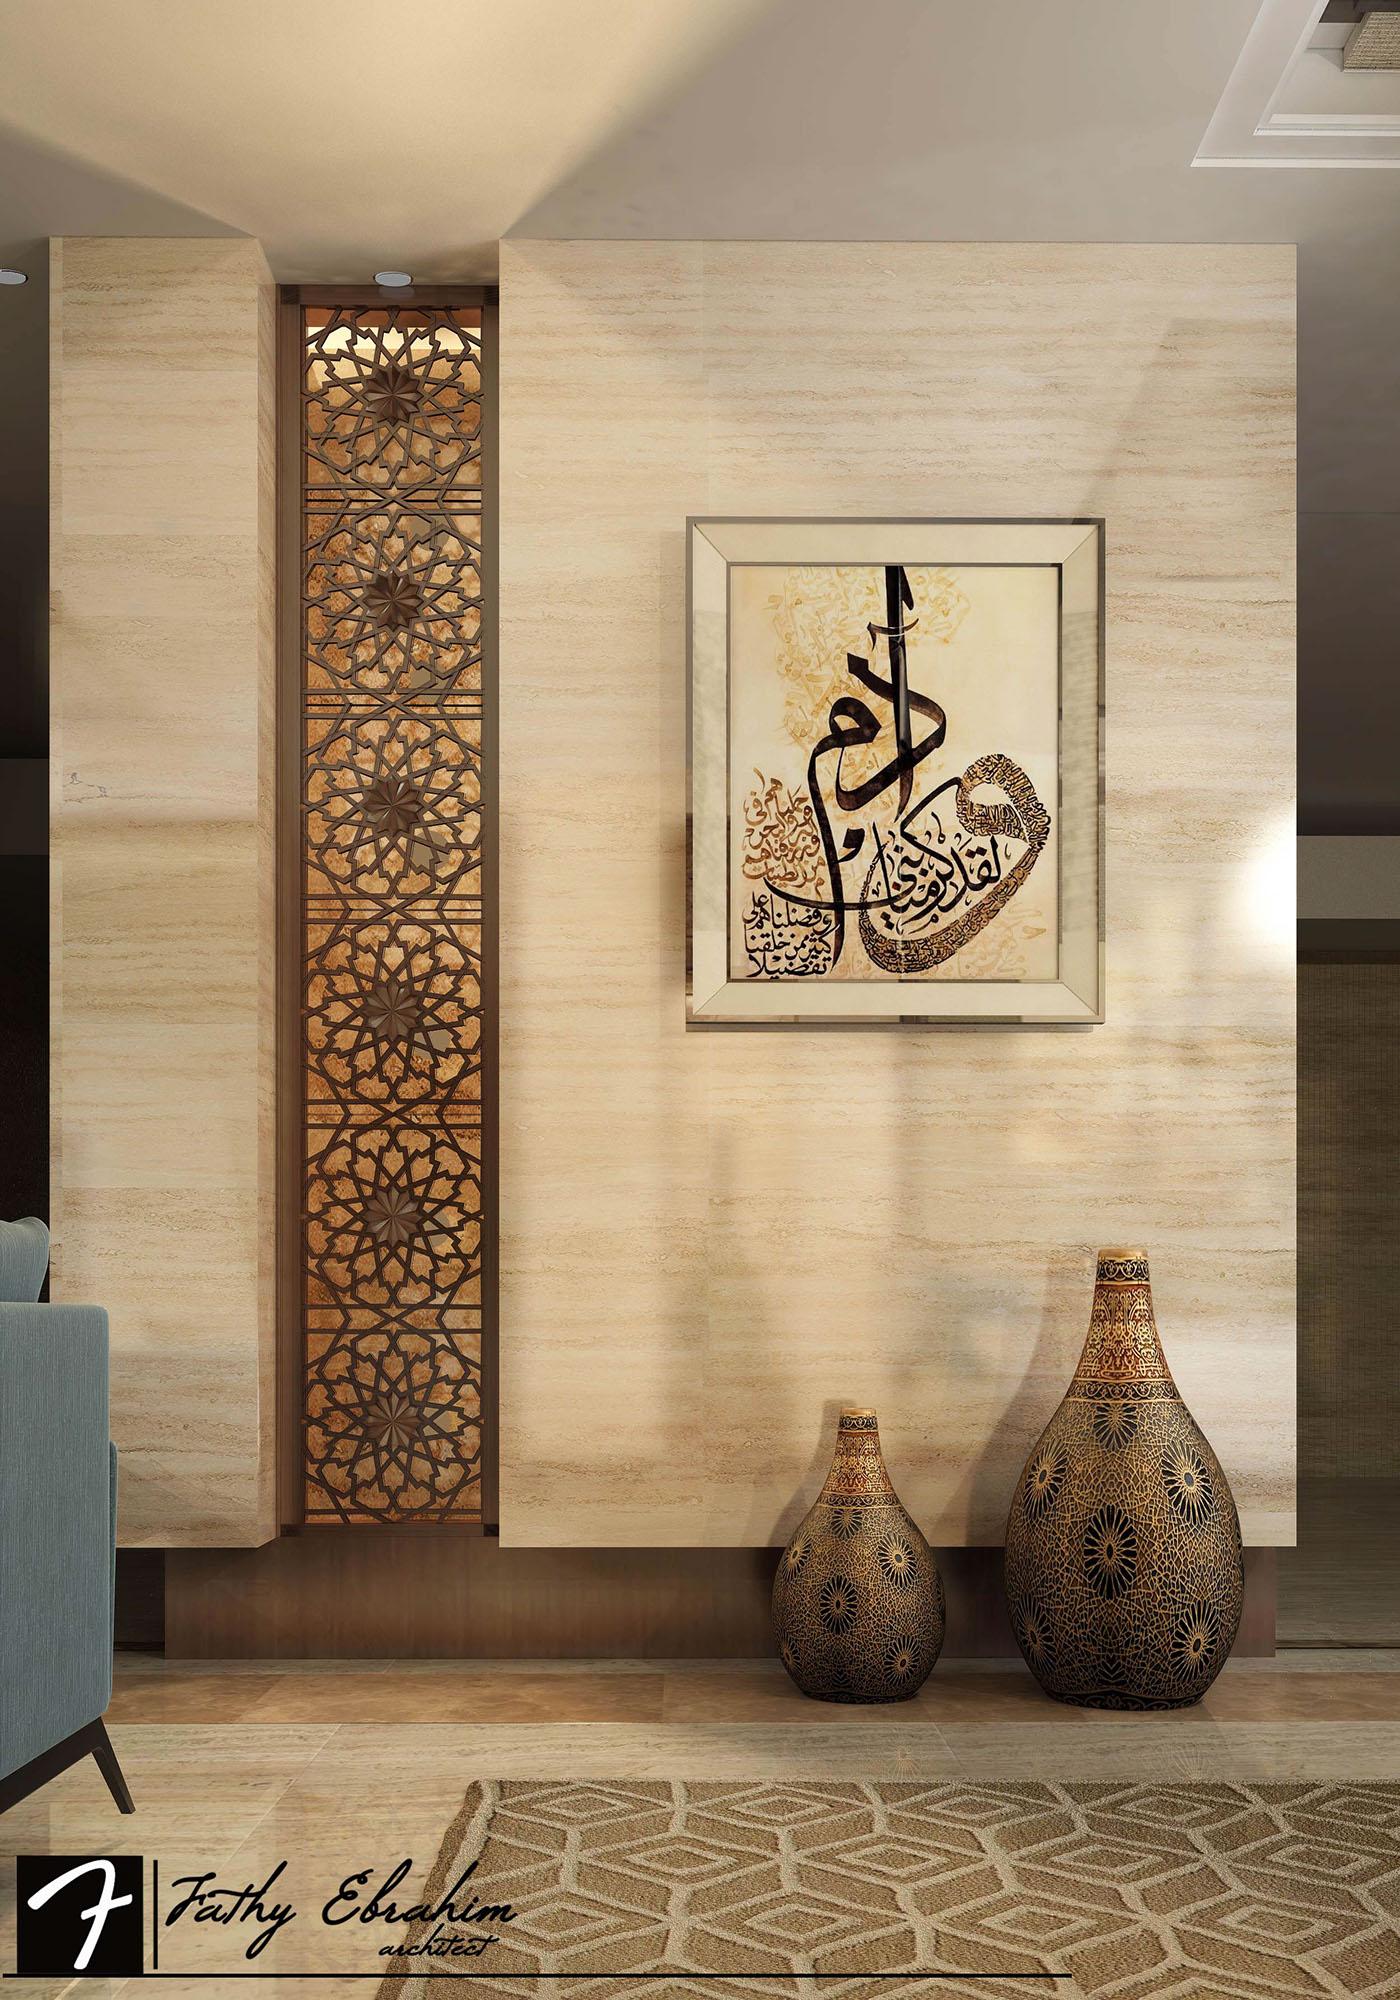 Modern islamic interior design fathy ibrahim • follow following unfollow save to collection